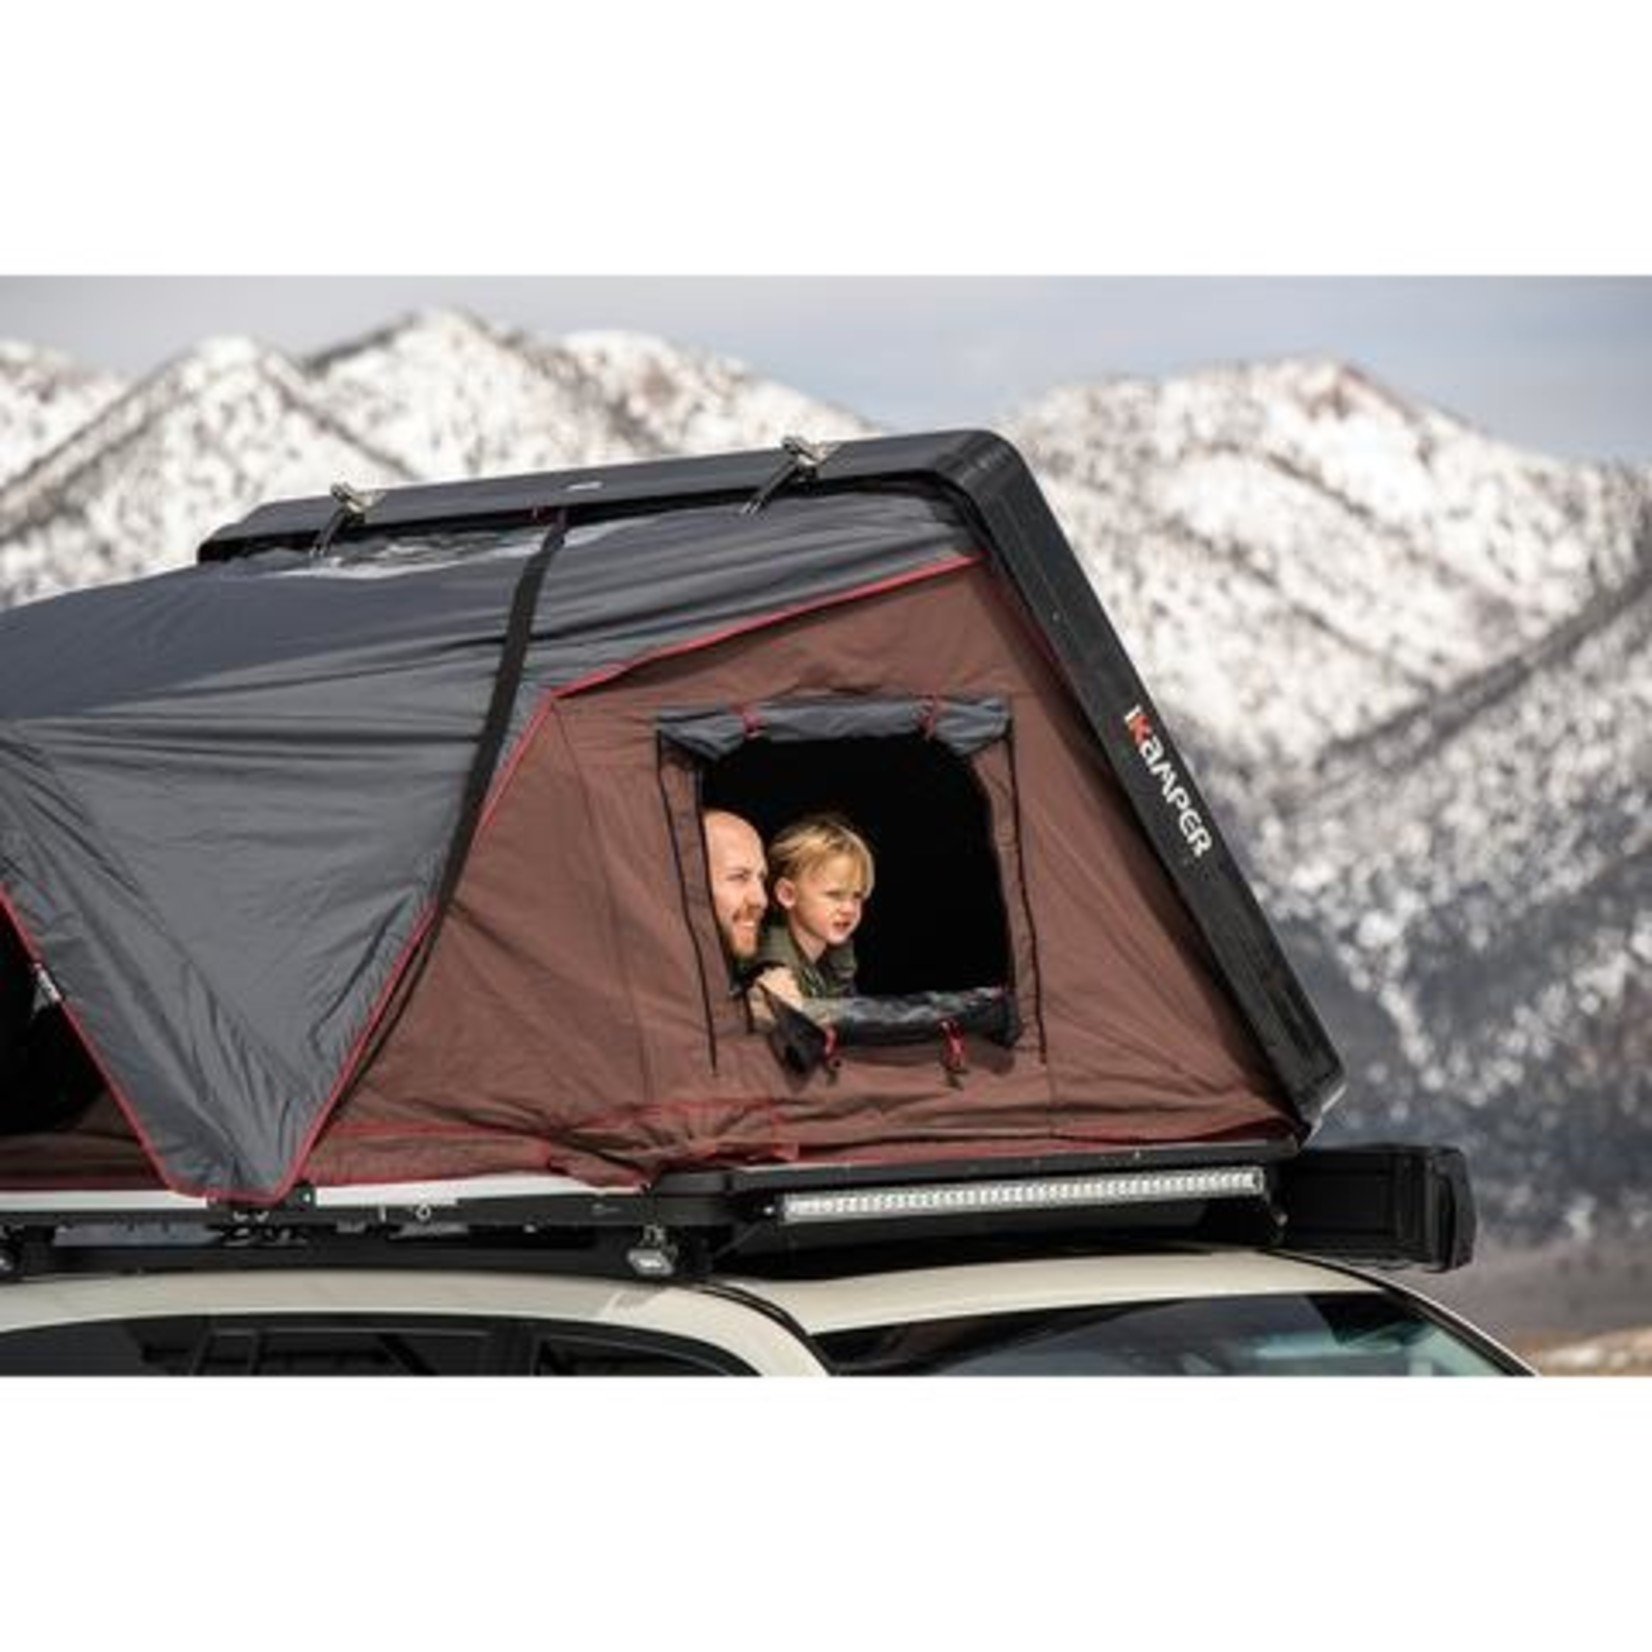 iKamper iKamper Skycamp 2.0 Rooftop Tent